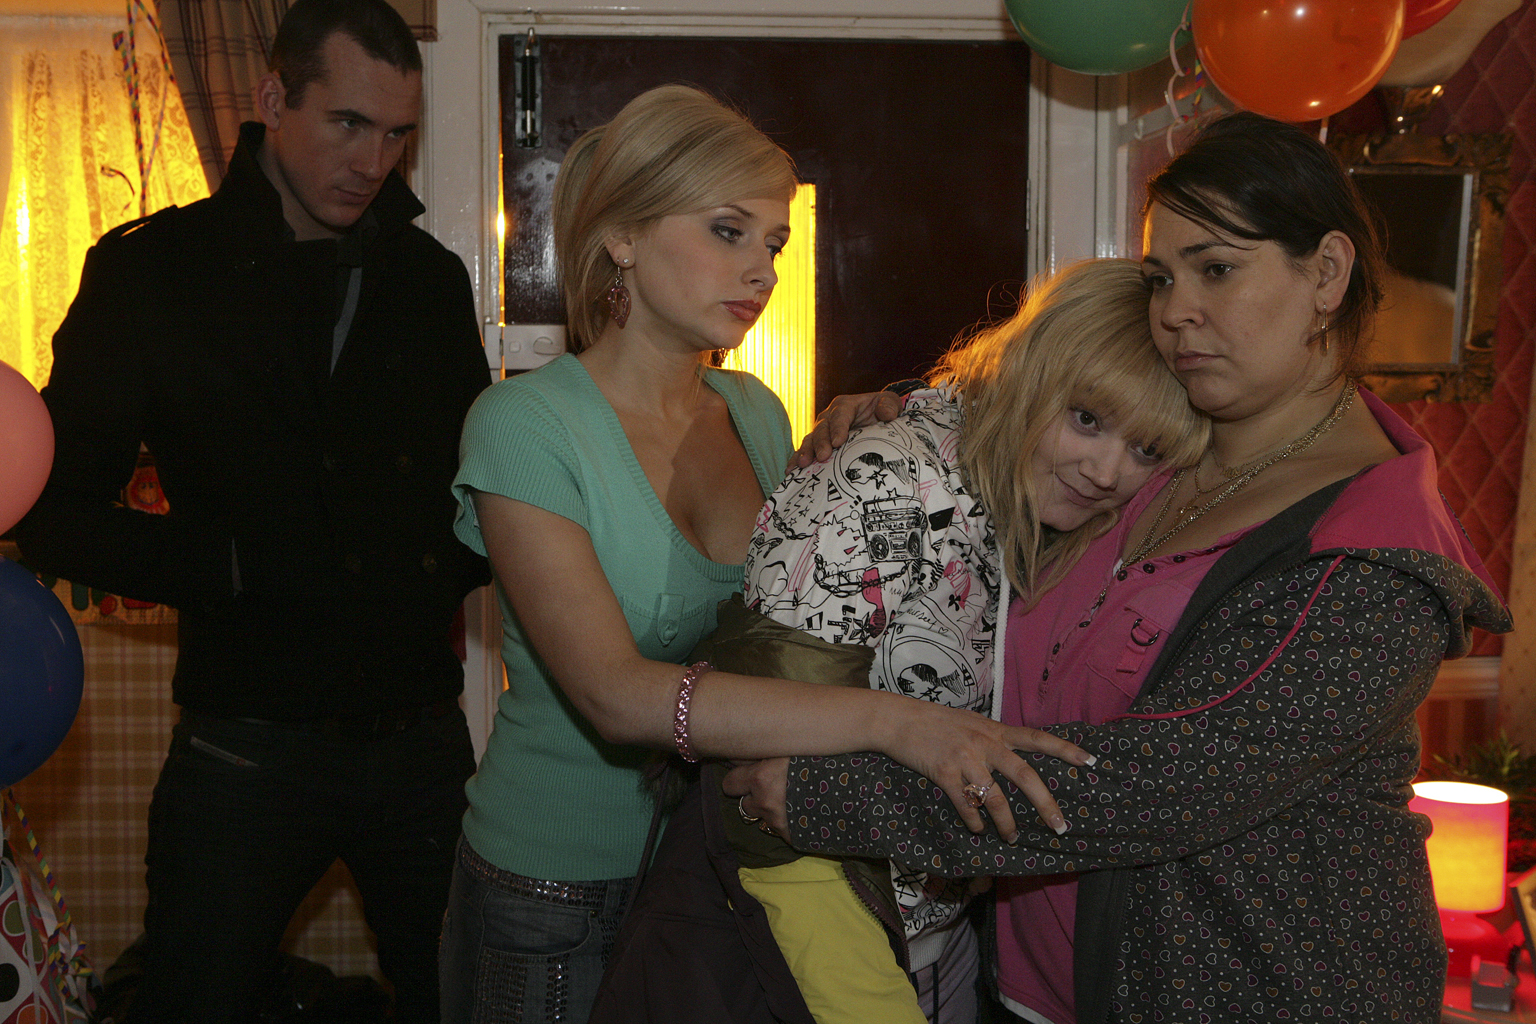 Amy chucks Michaela out